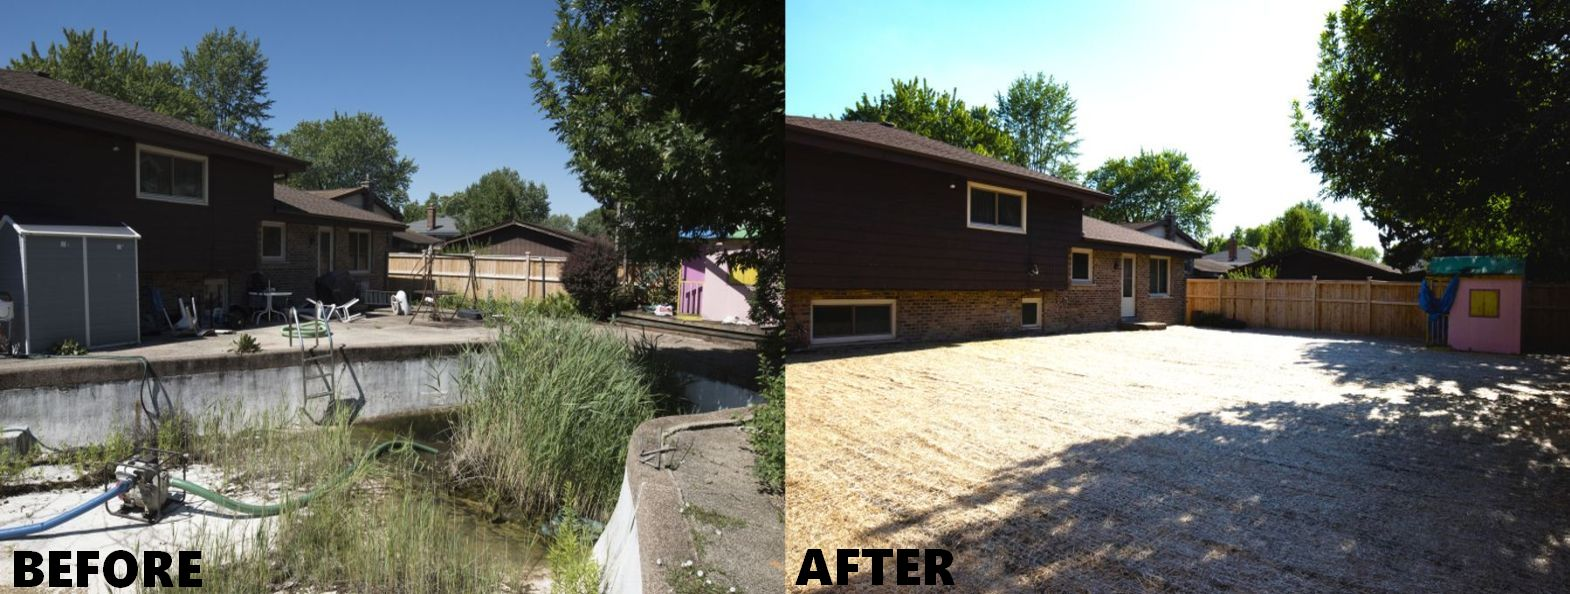 Mack Land LLC - Addison Pool Removal